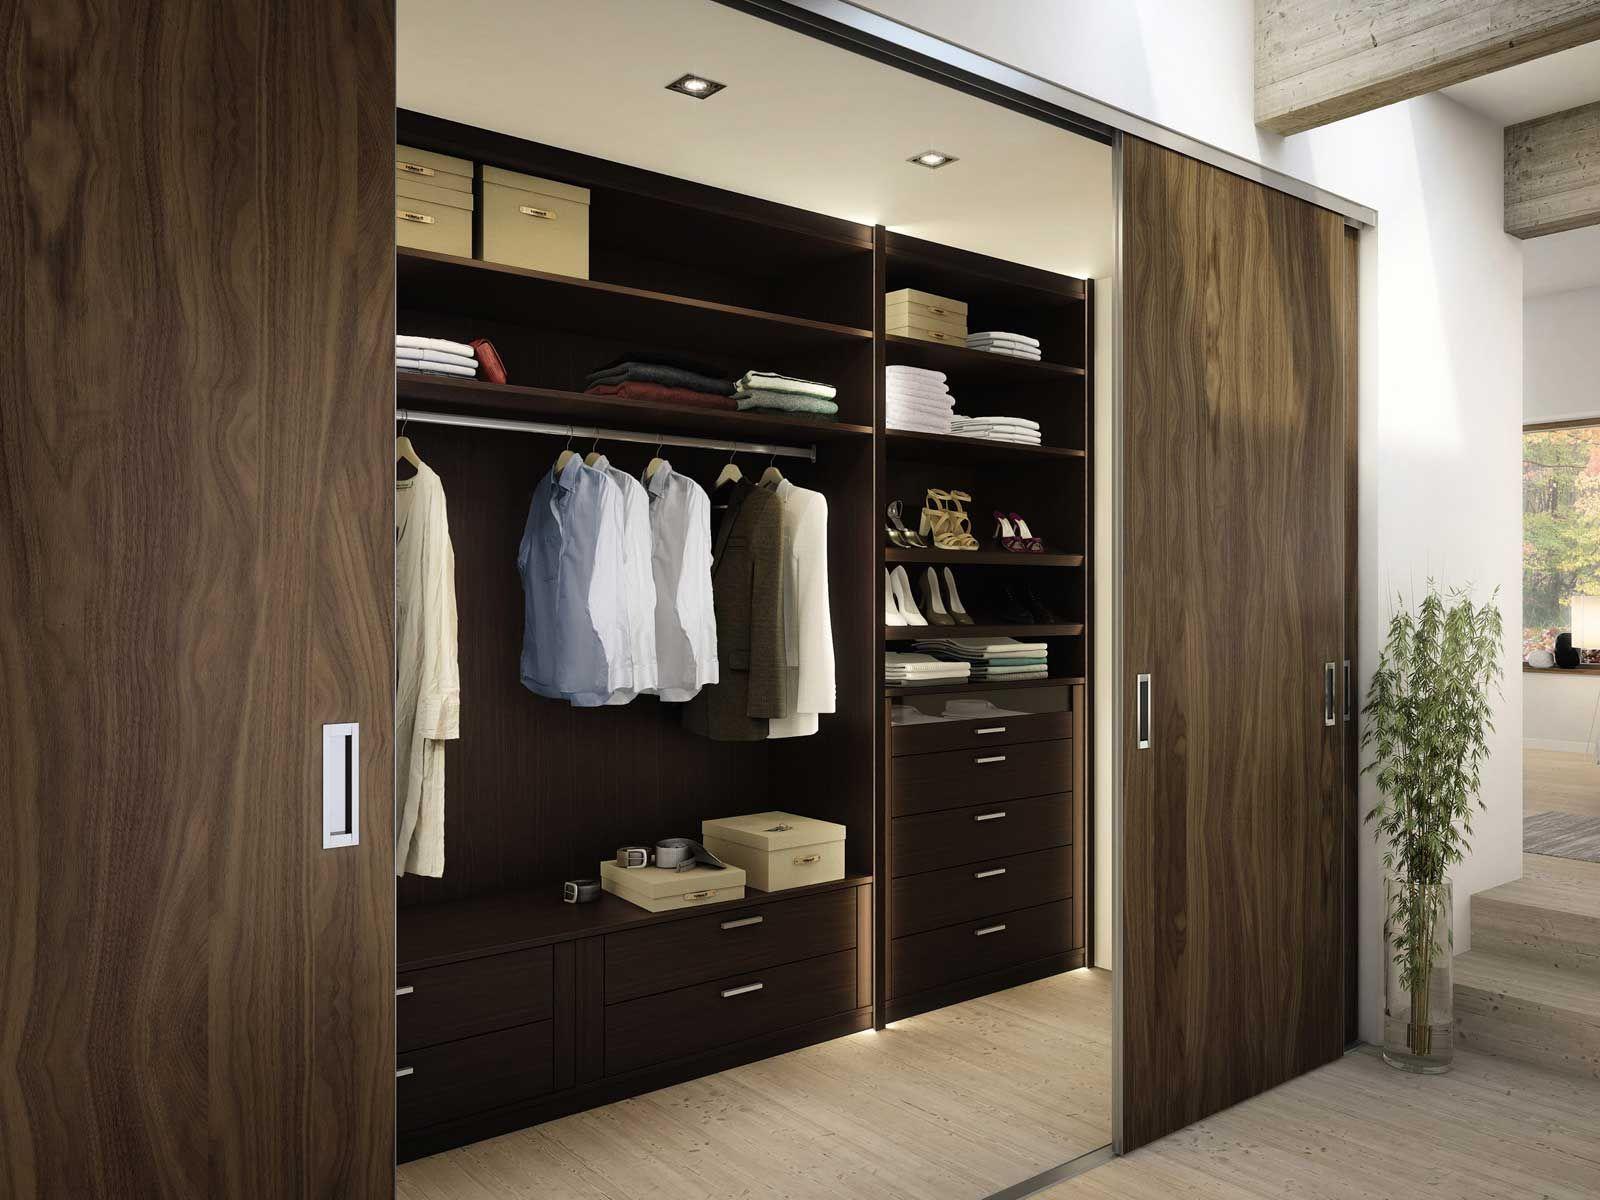 Vestidor con puertas corredizas home room pinterest for Medidas closets modernos